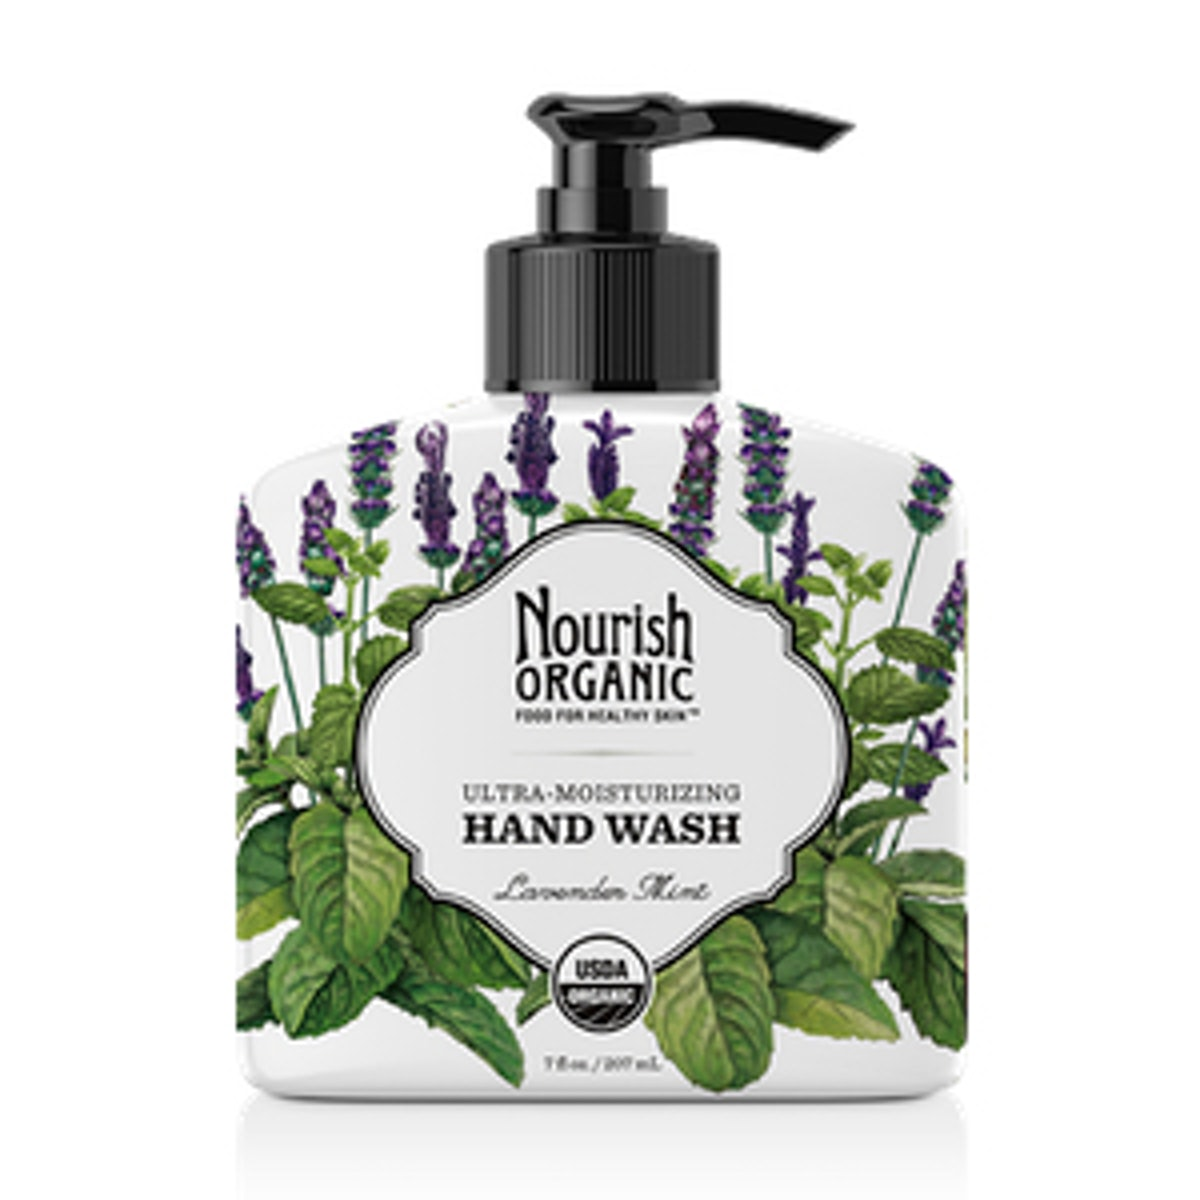 Ultra-Moisturizing Organic Hand Wash